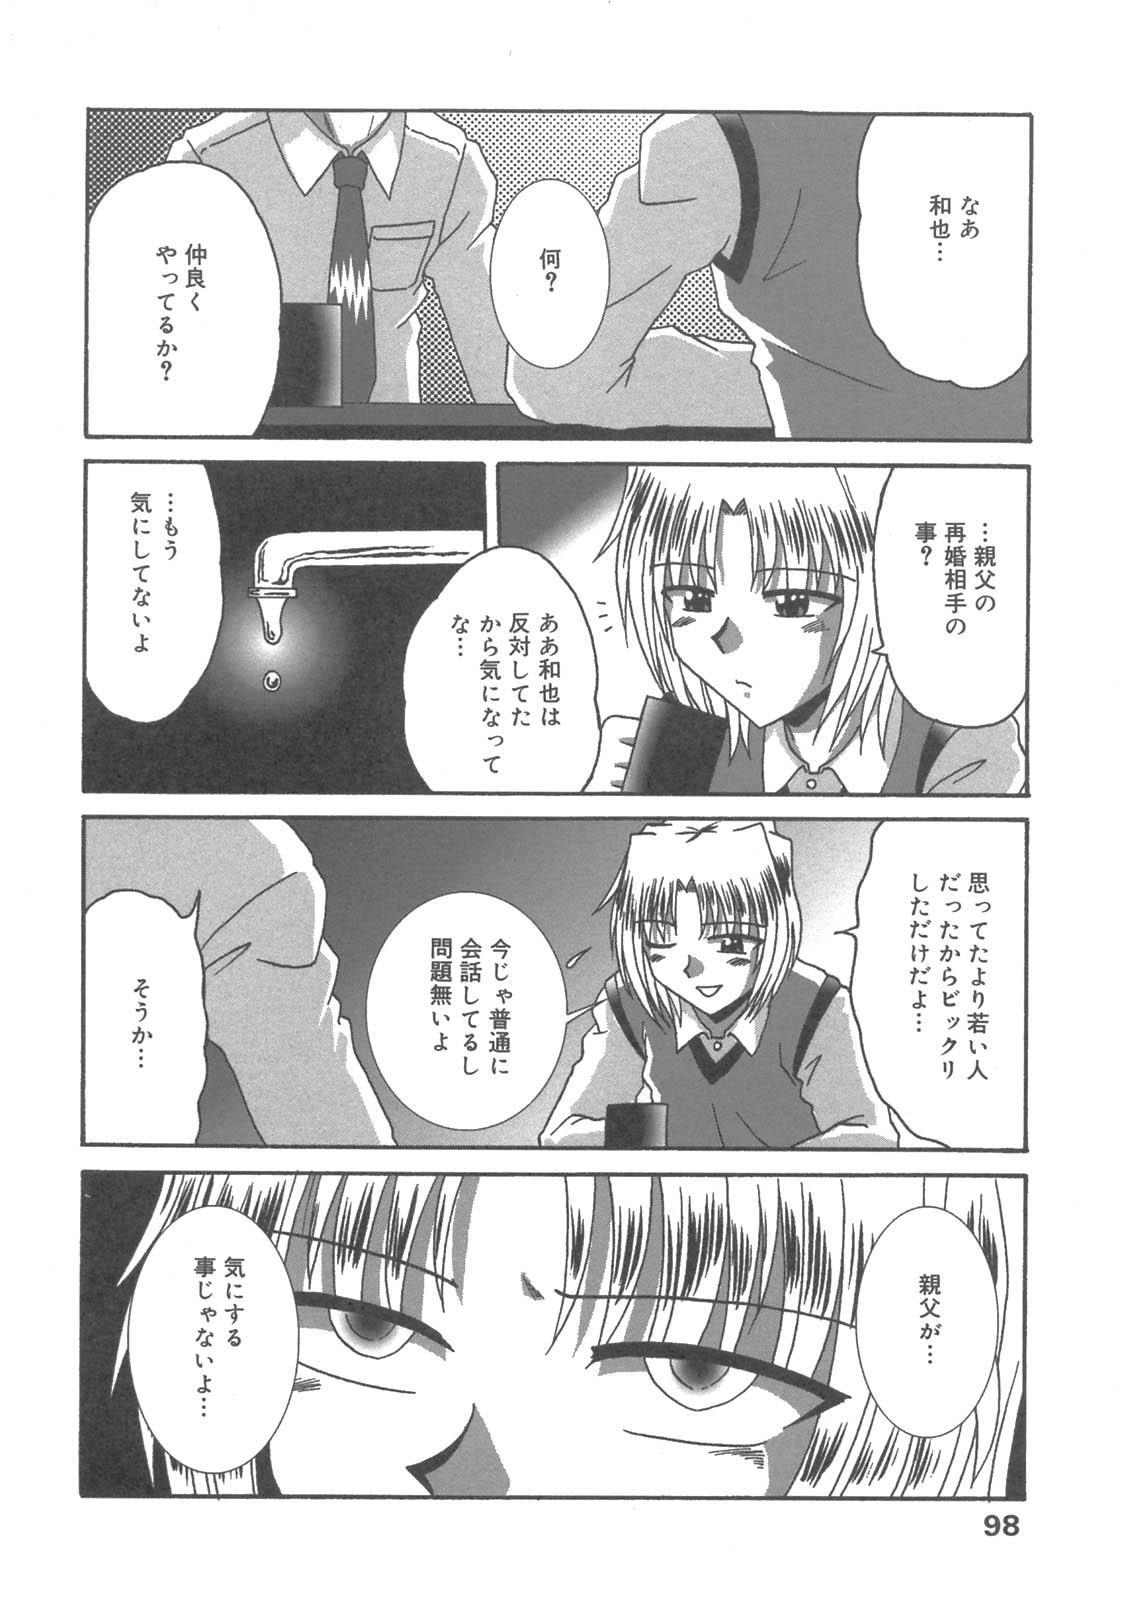 Kanbo Choukyou Sora 94